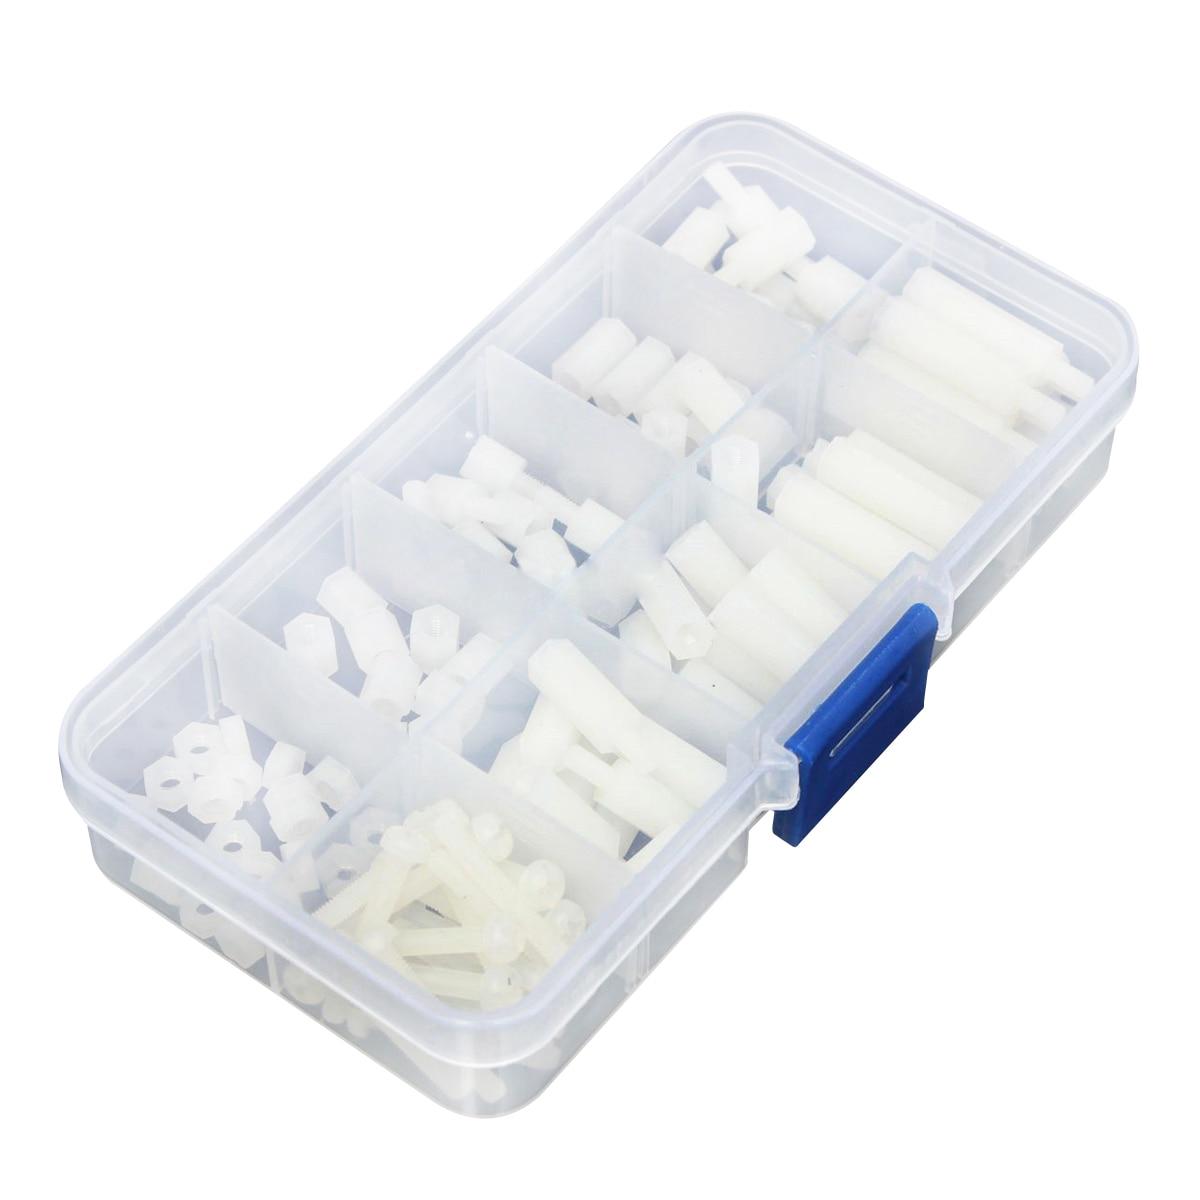 Box of 120Pcs M3 Nylon Hex Spacers Screw Nut Stand-off Plastic Accessories Kit White 150pcs m3 white hex spacers nylon screw nut washer assortment standoff kit stand off plastic